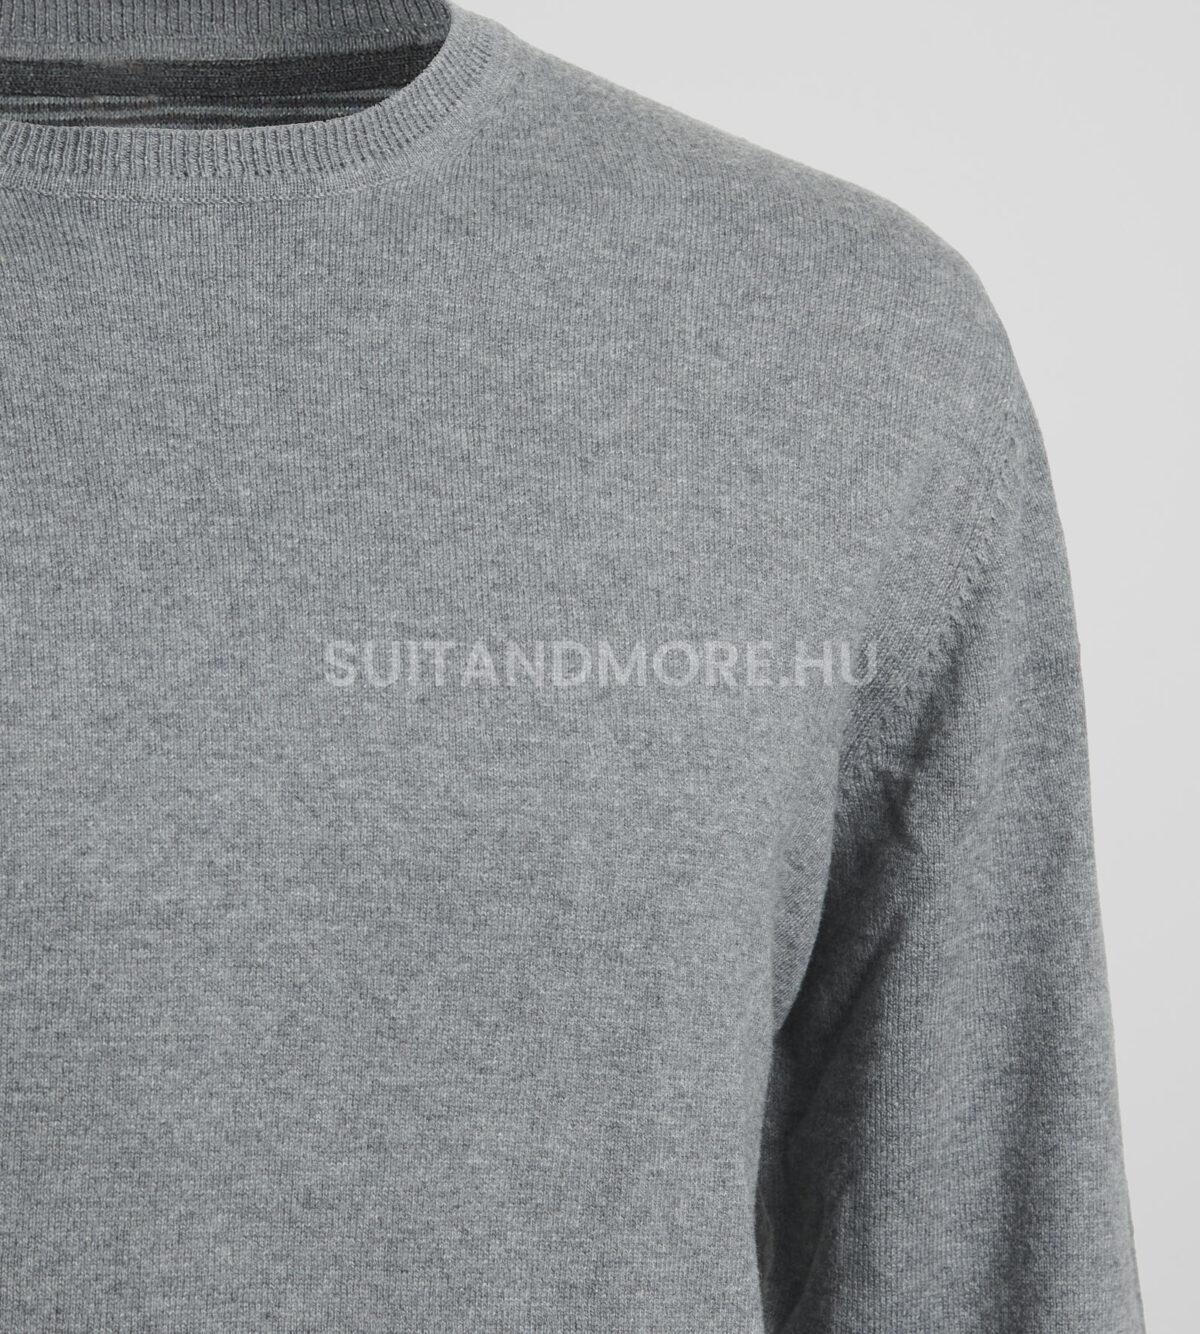 digel-kozepszurke-modern-fit-kerek-nyaku-gyapju-pulover-faros1-1-1268001-45-02